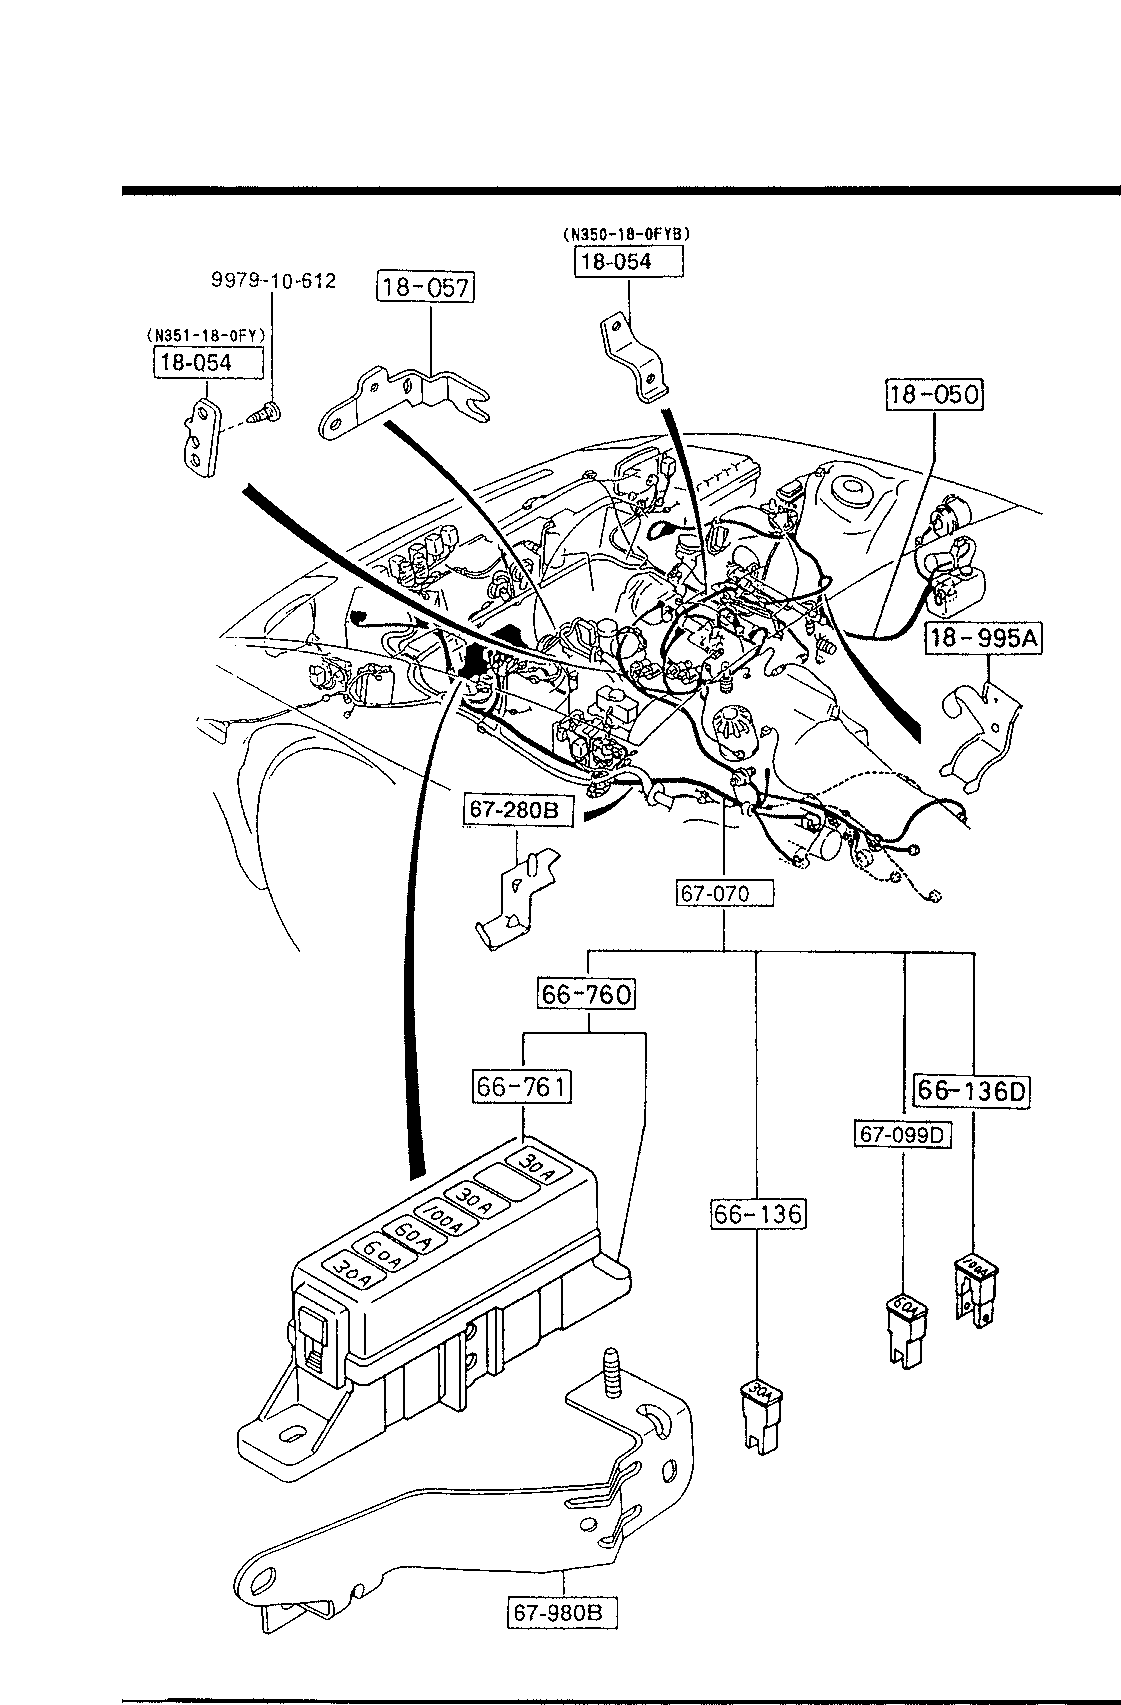 1991 Rx7 Wiring Diagram